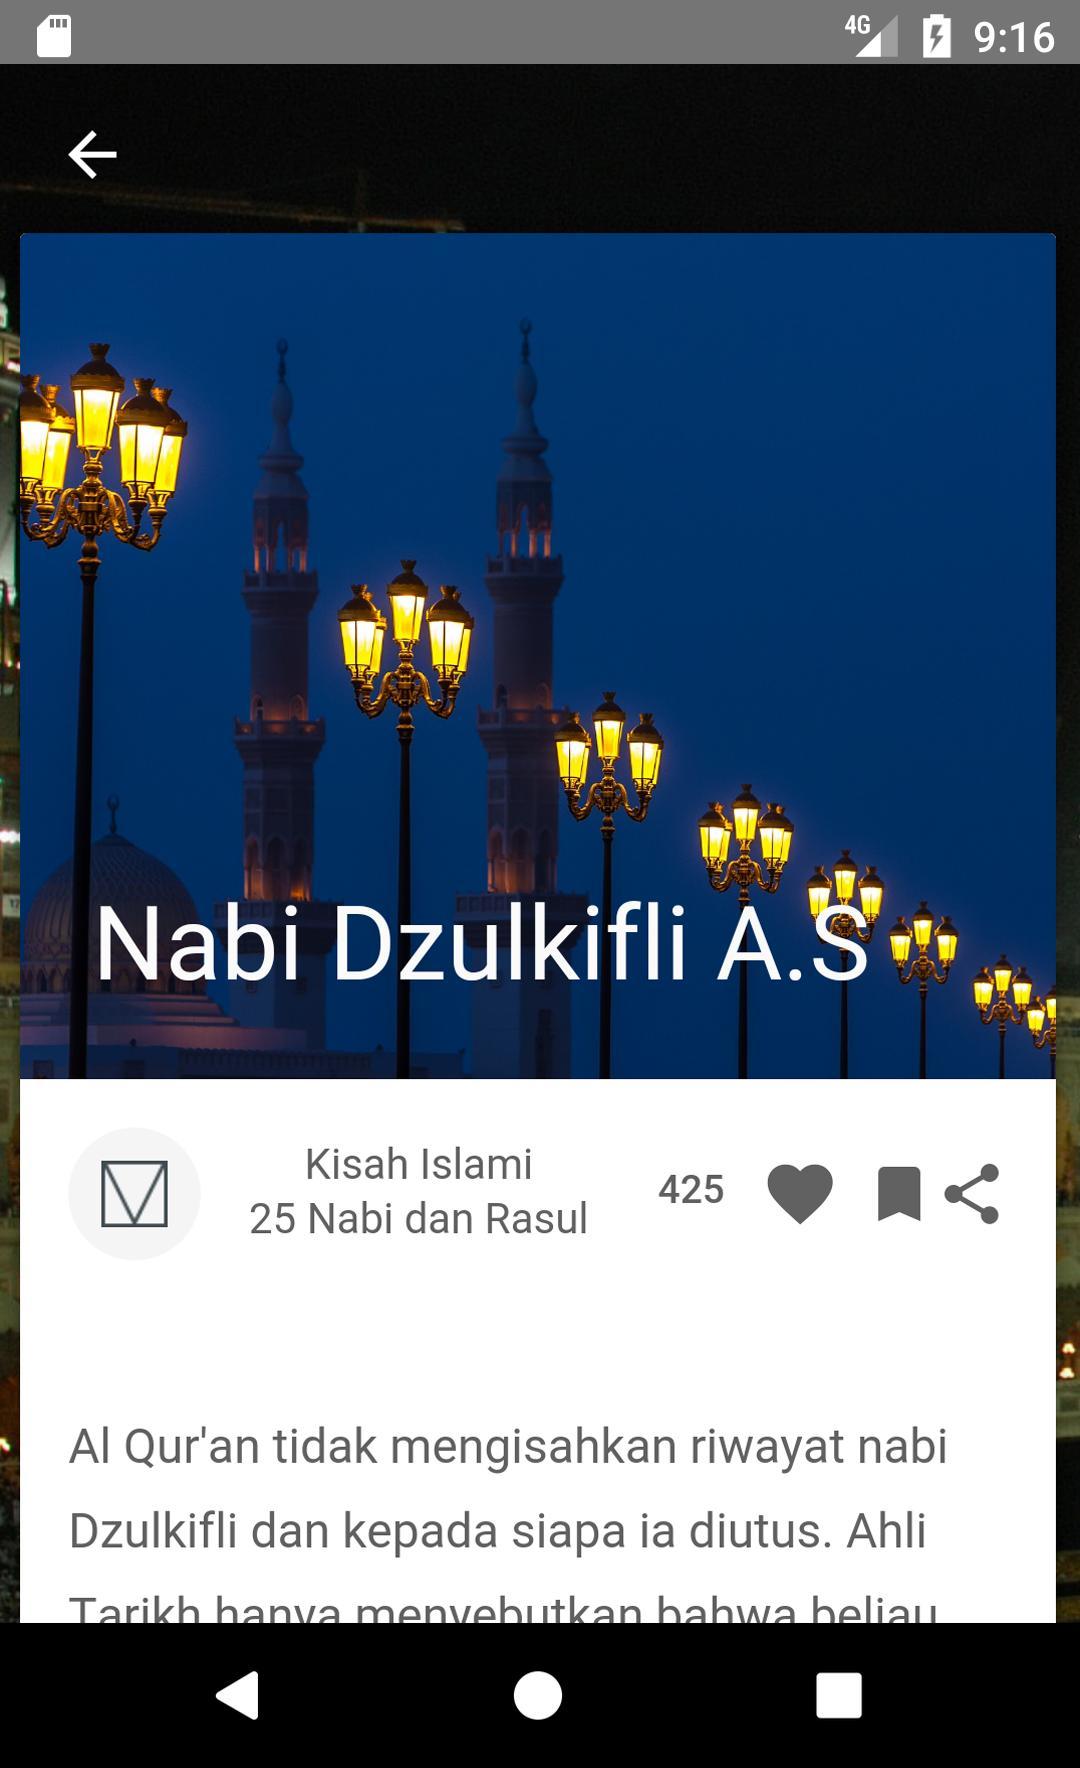 Kisah Islami 25 Nabi Dan Rasul poster